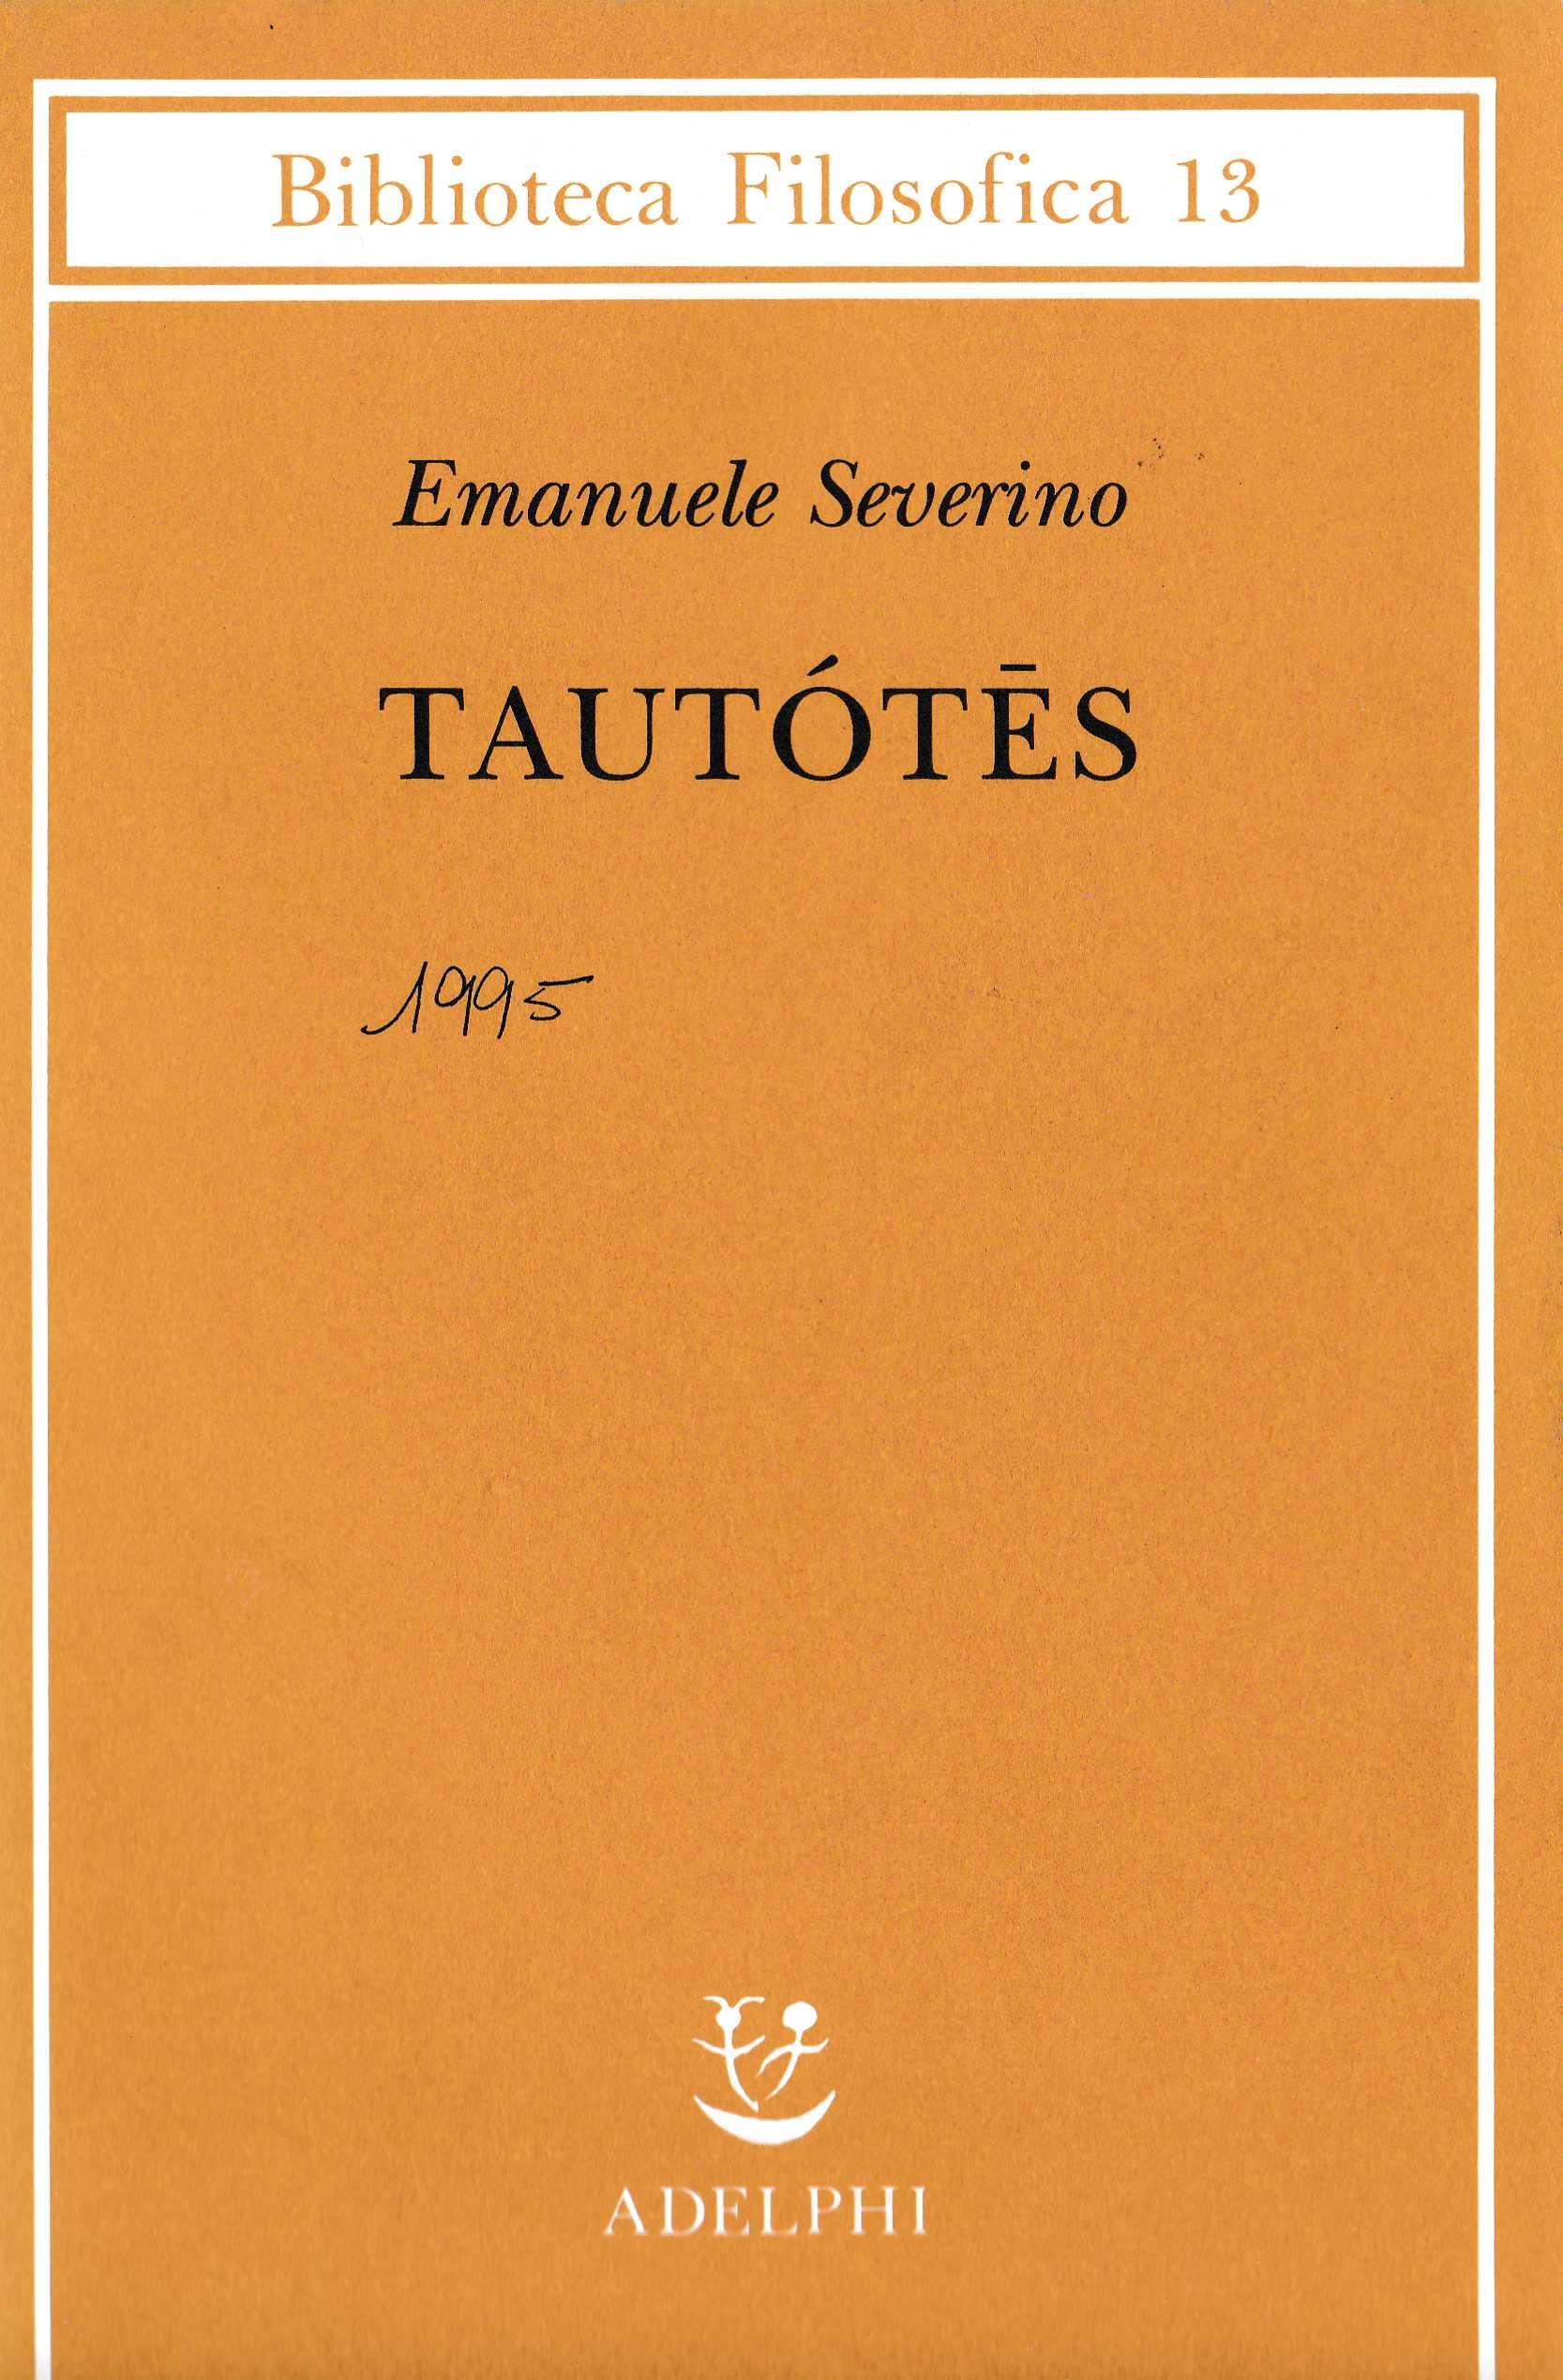 tautotes4303